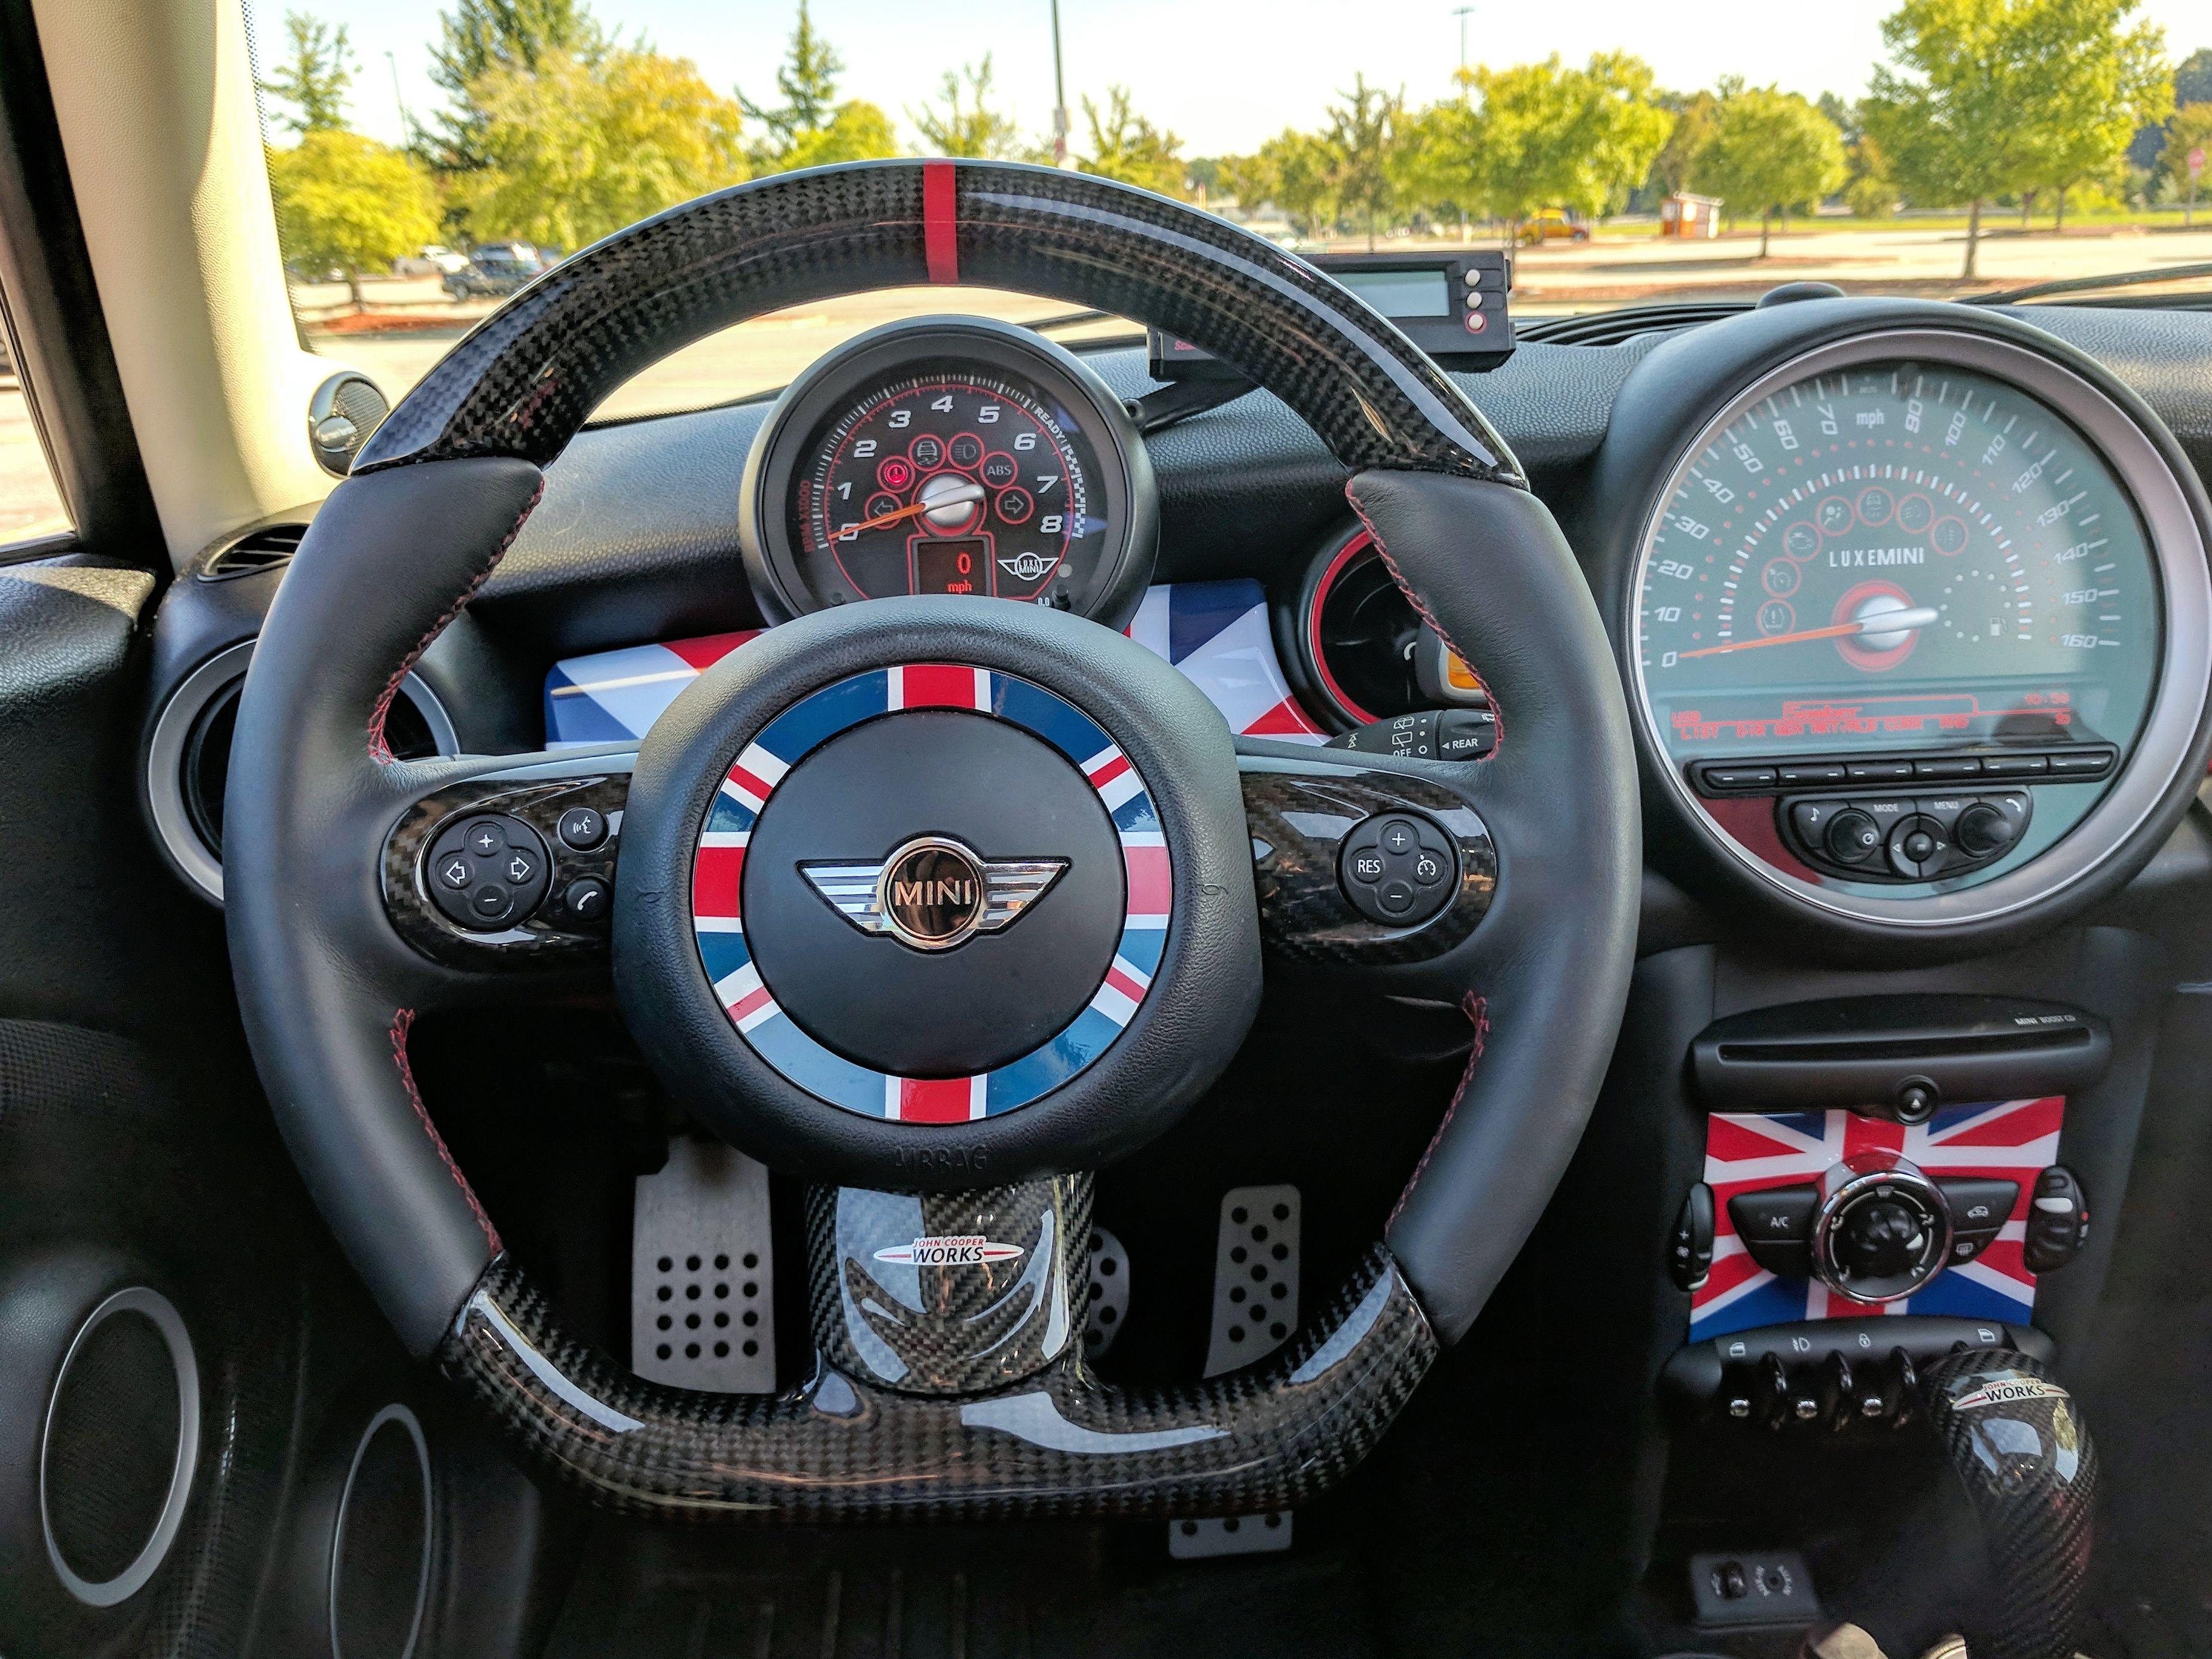 Mini Cooper Carbon Custom Steering Wheel Find Us On Facebook Click Visit Minicooper Carbonfibre Customsteeringwheel